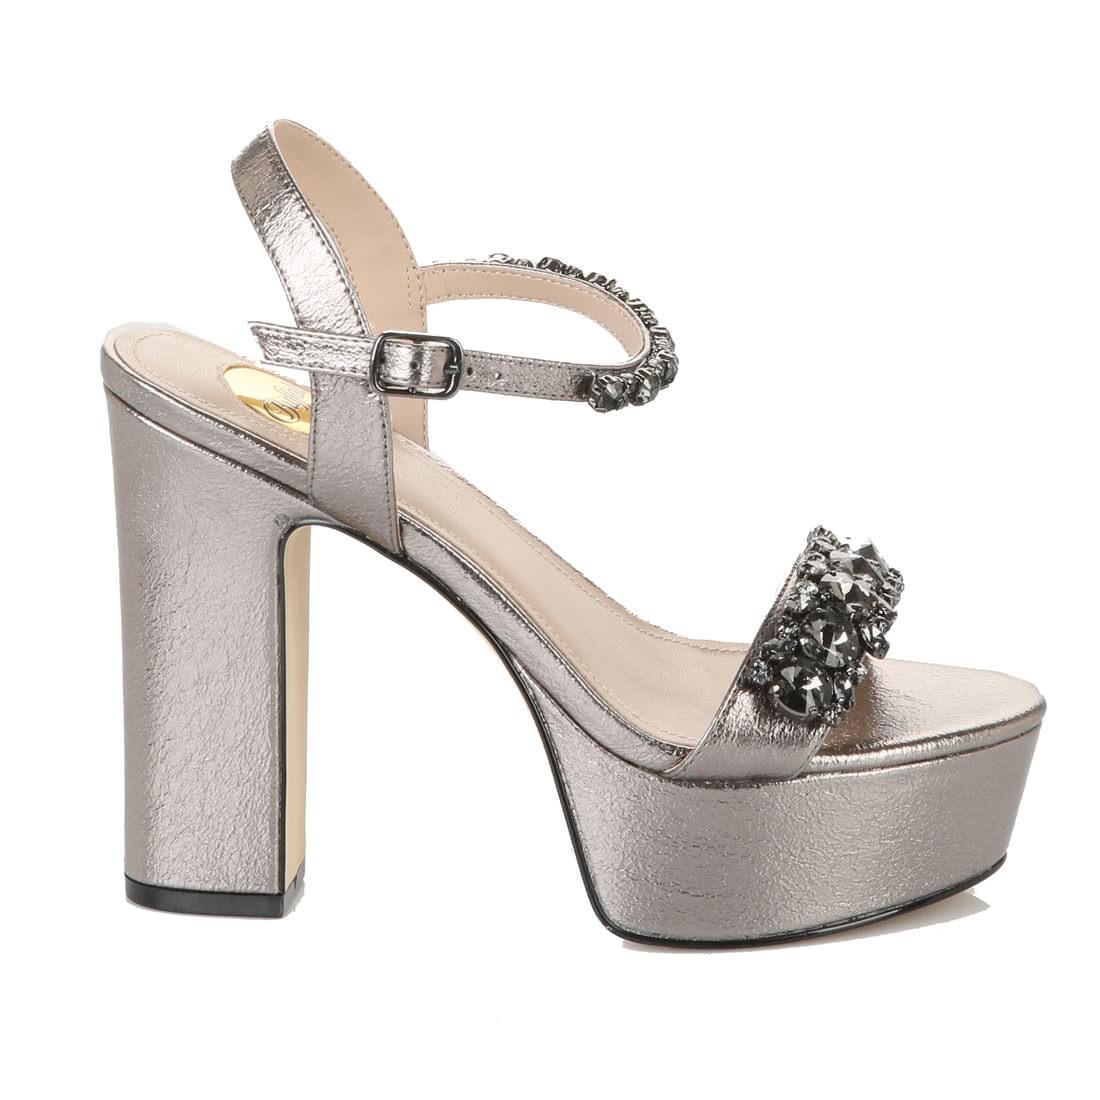 486443a3d4d Pearl Blush platform ankle-strap sandal metallic tin coloured buy ...